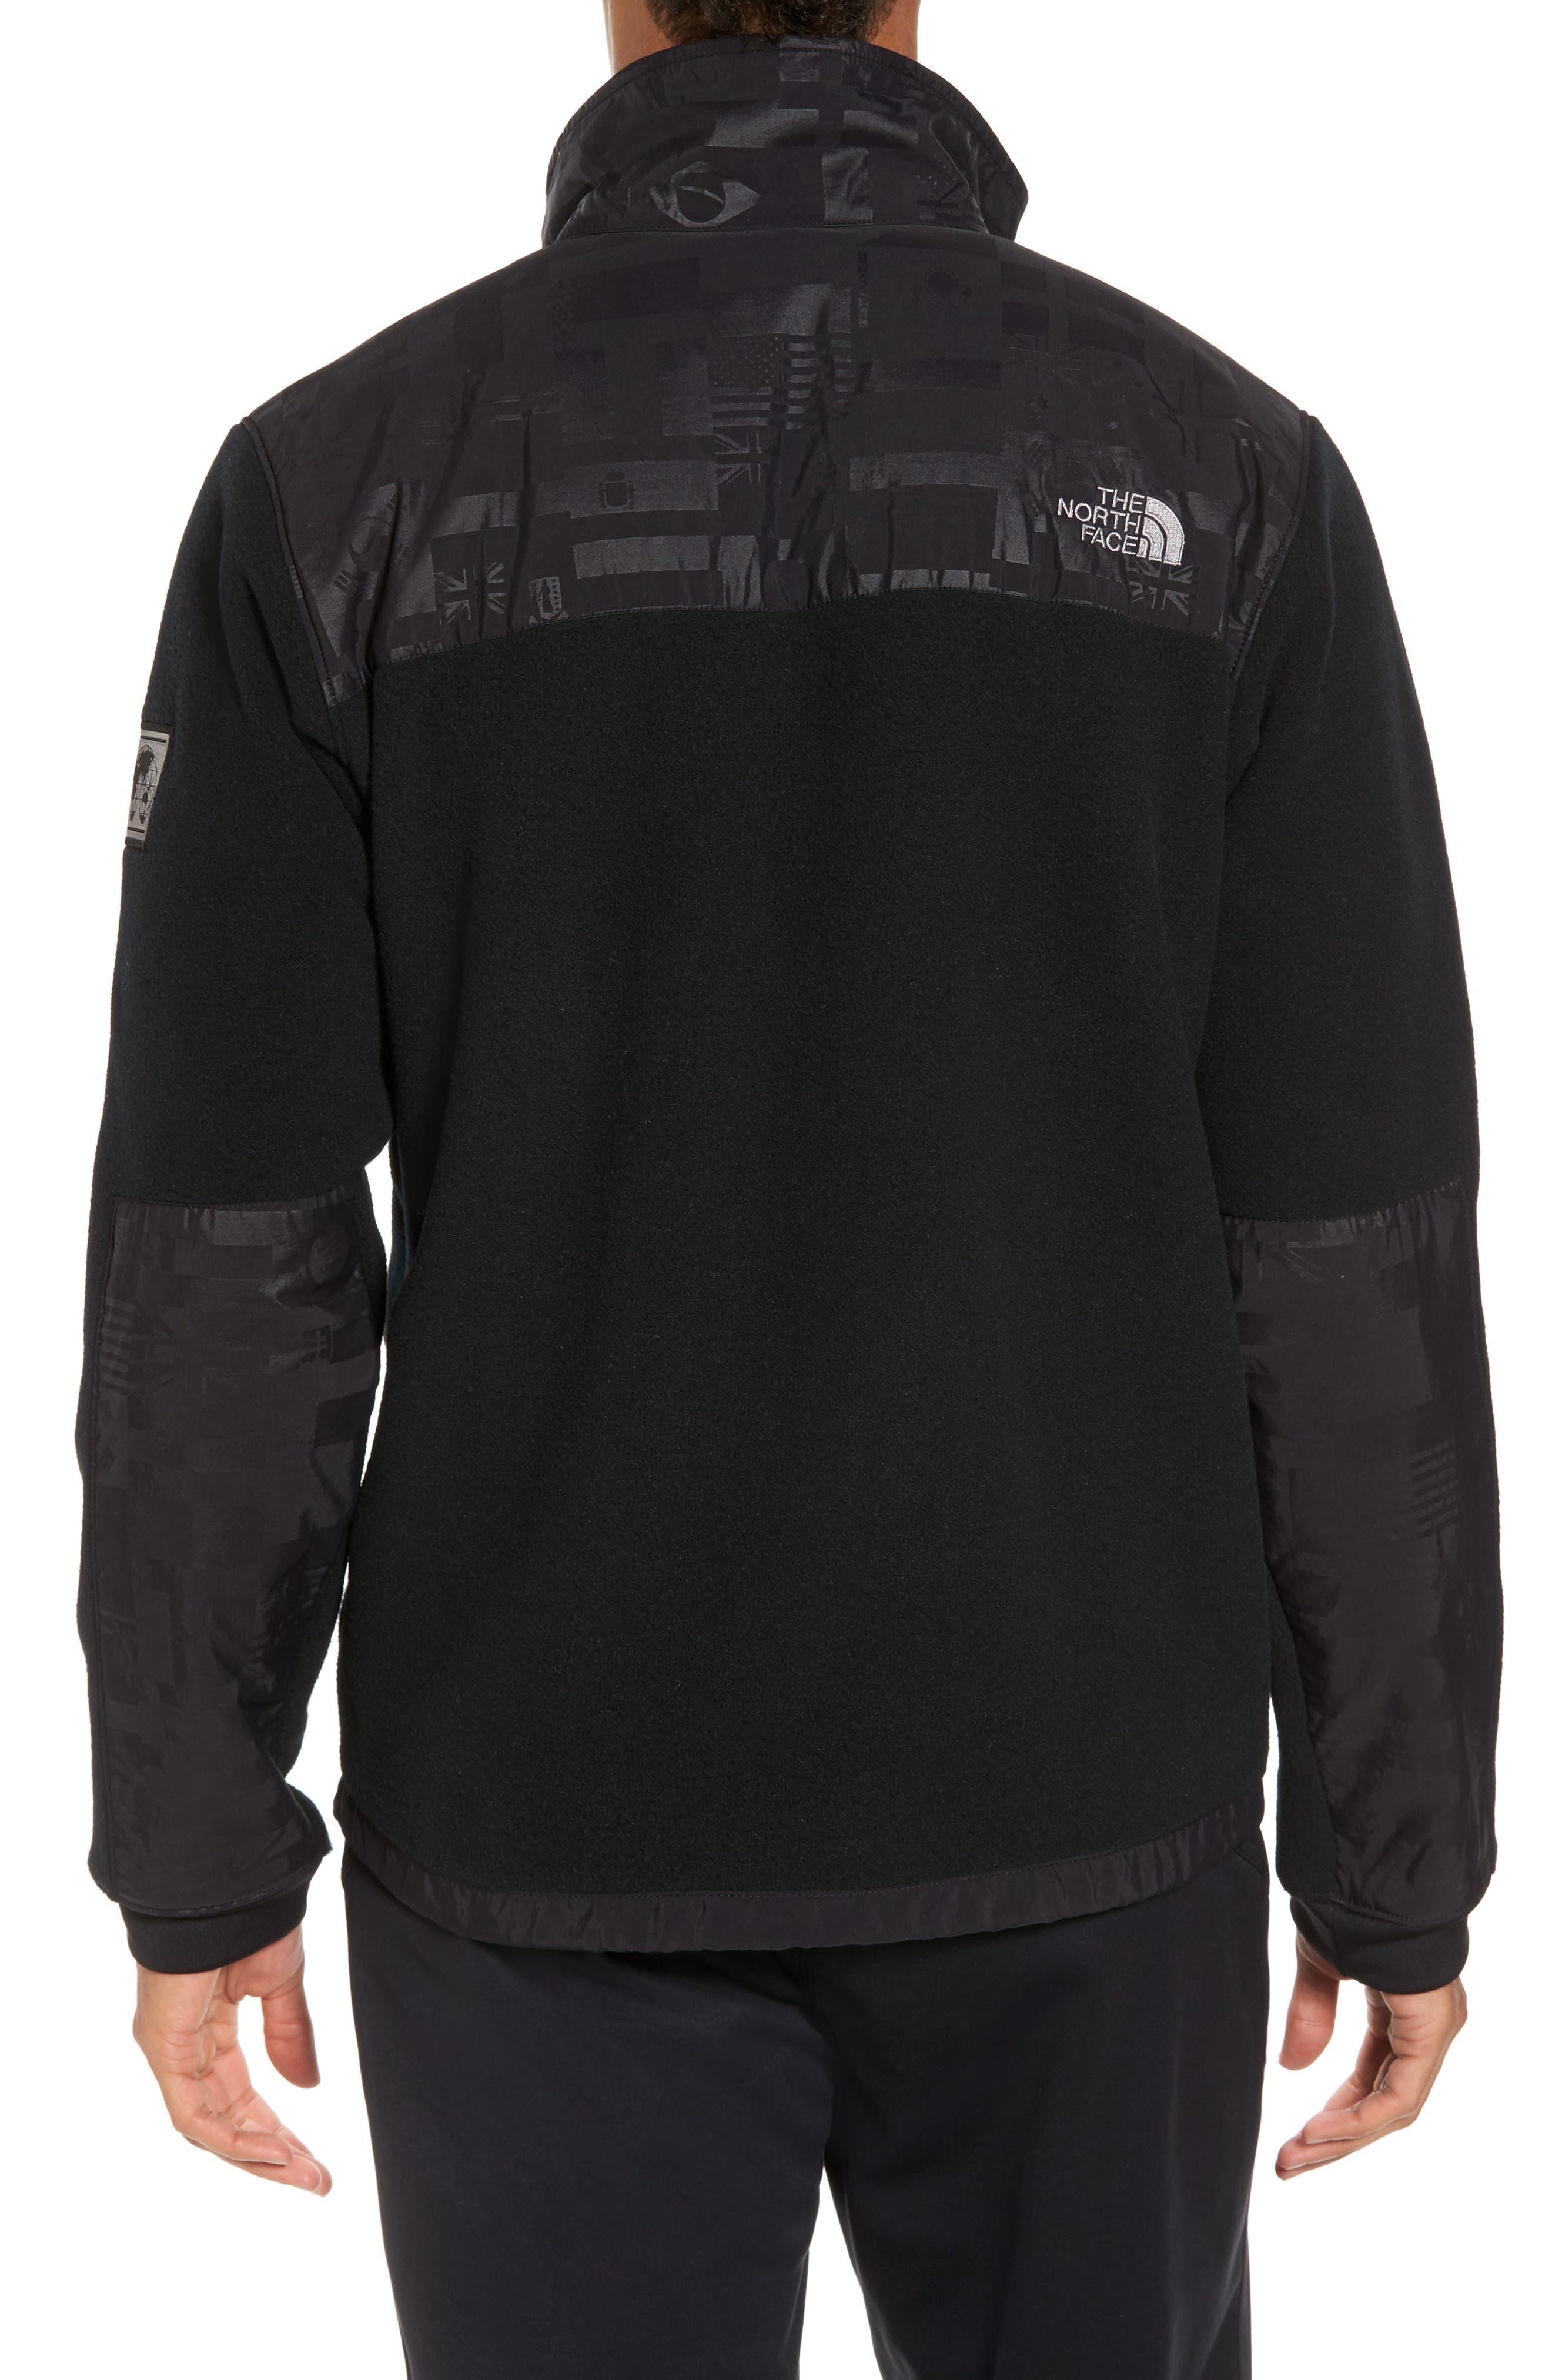 Denali 2 Polartec<sup>®</sup> Fleece Hoodie,                             Alternate thumbnail 2, color,                             Black